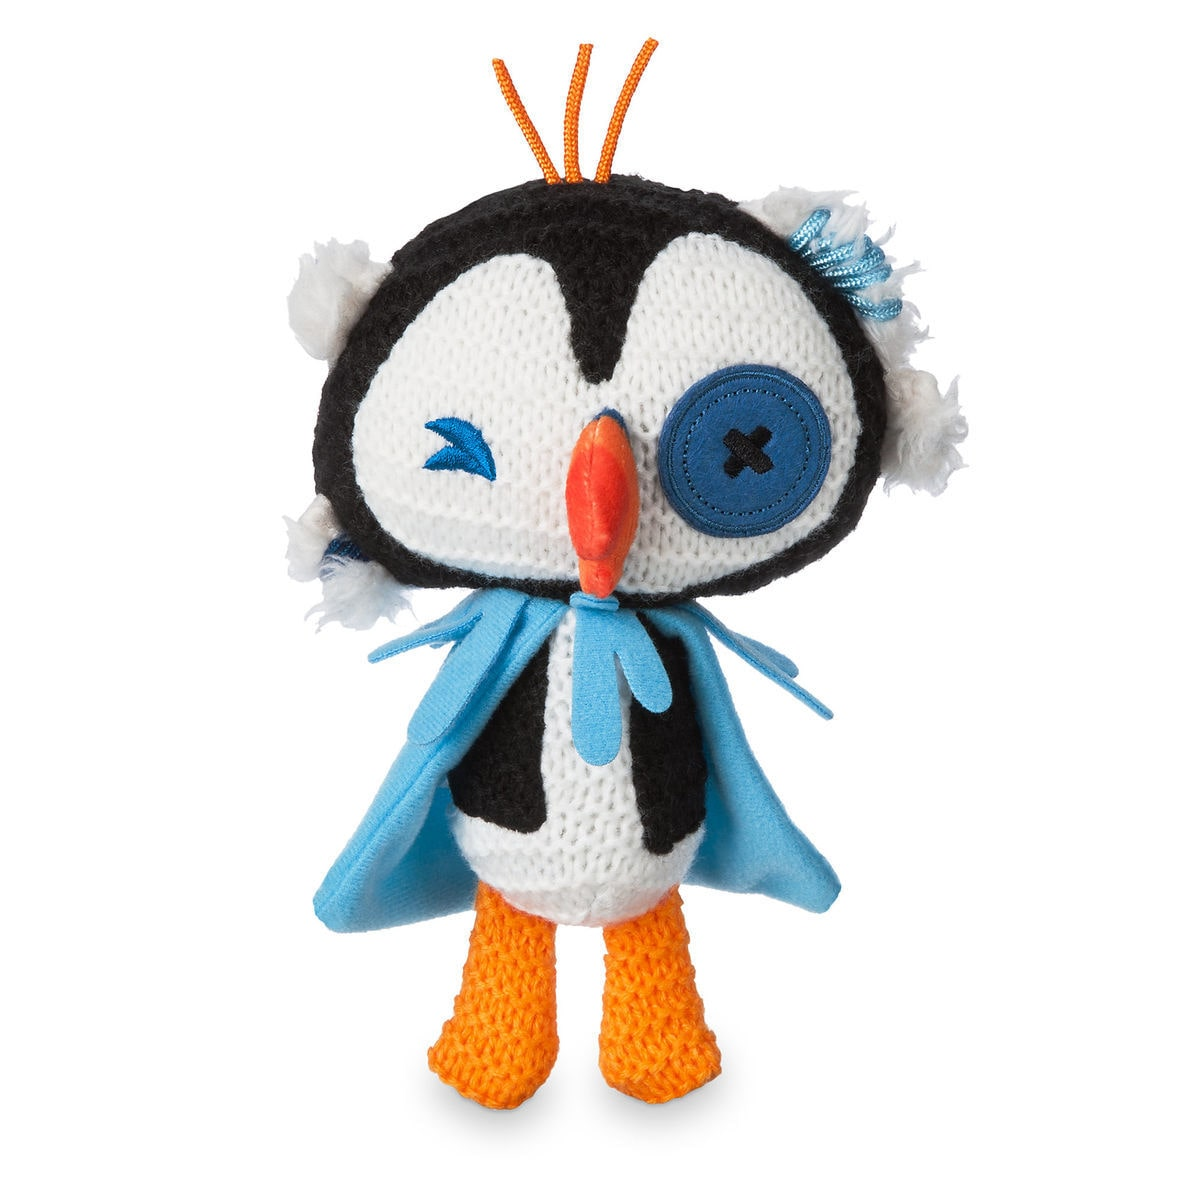 Sir Jorgenbjorgen Plush Olafs Frozen Adventure Small 7 14